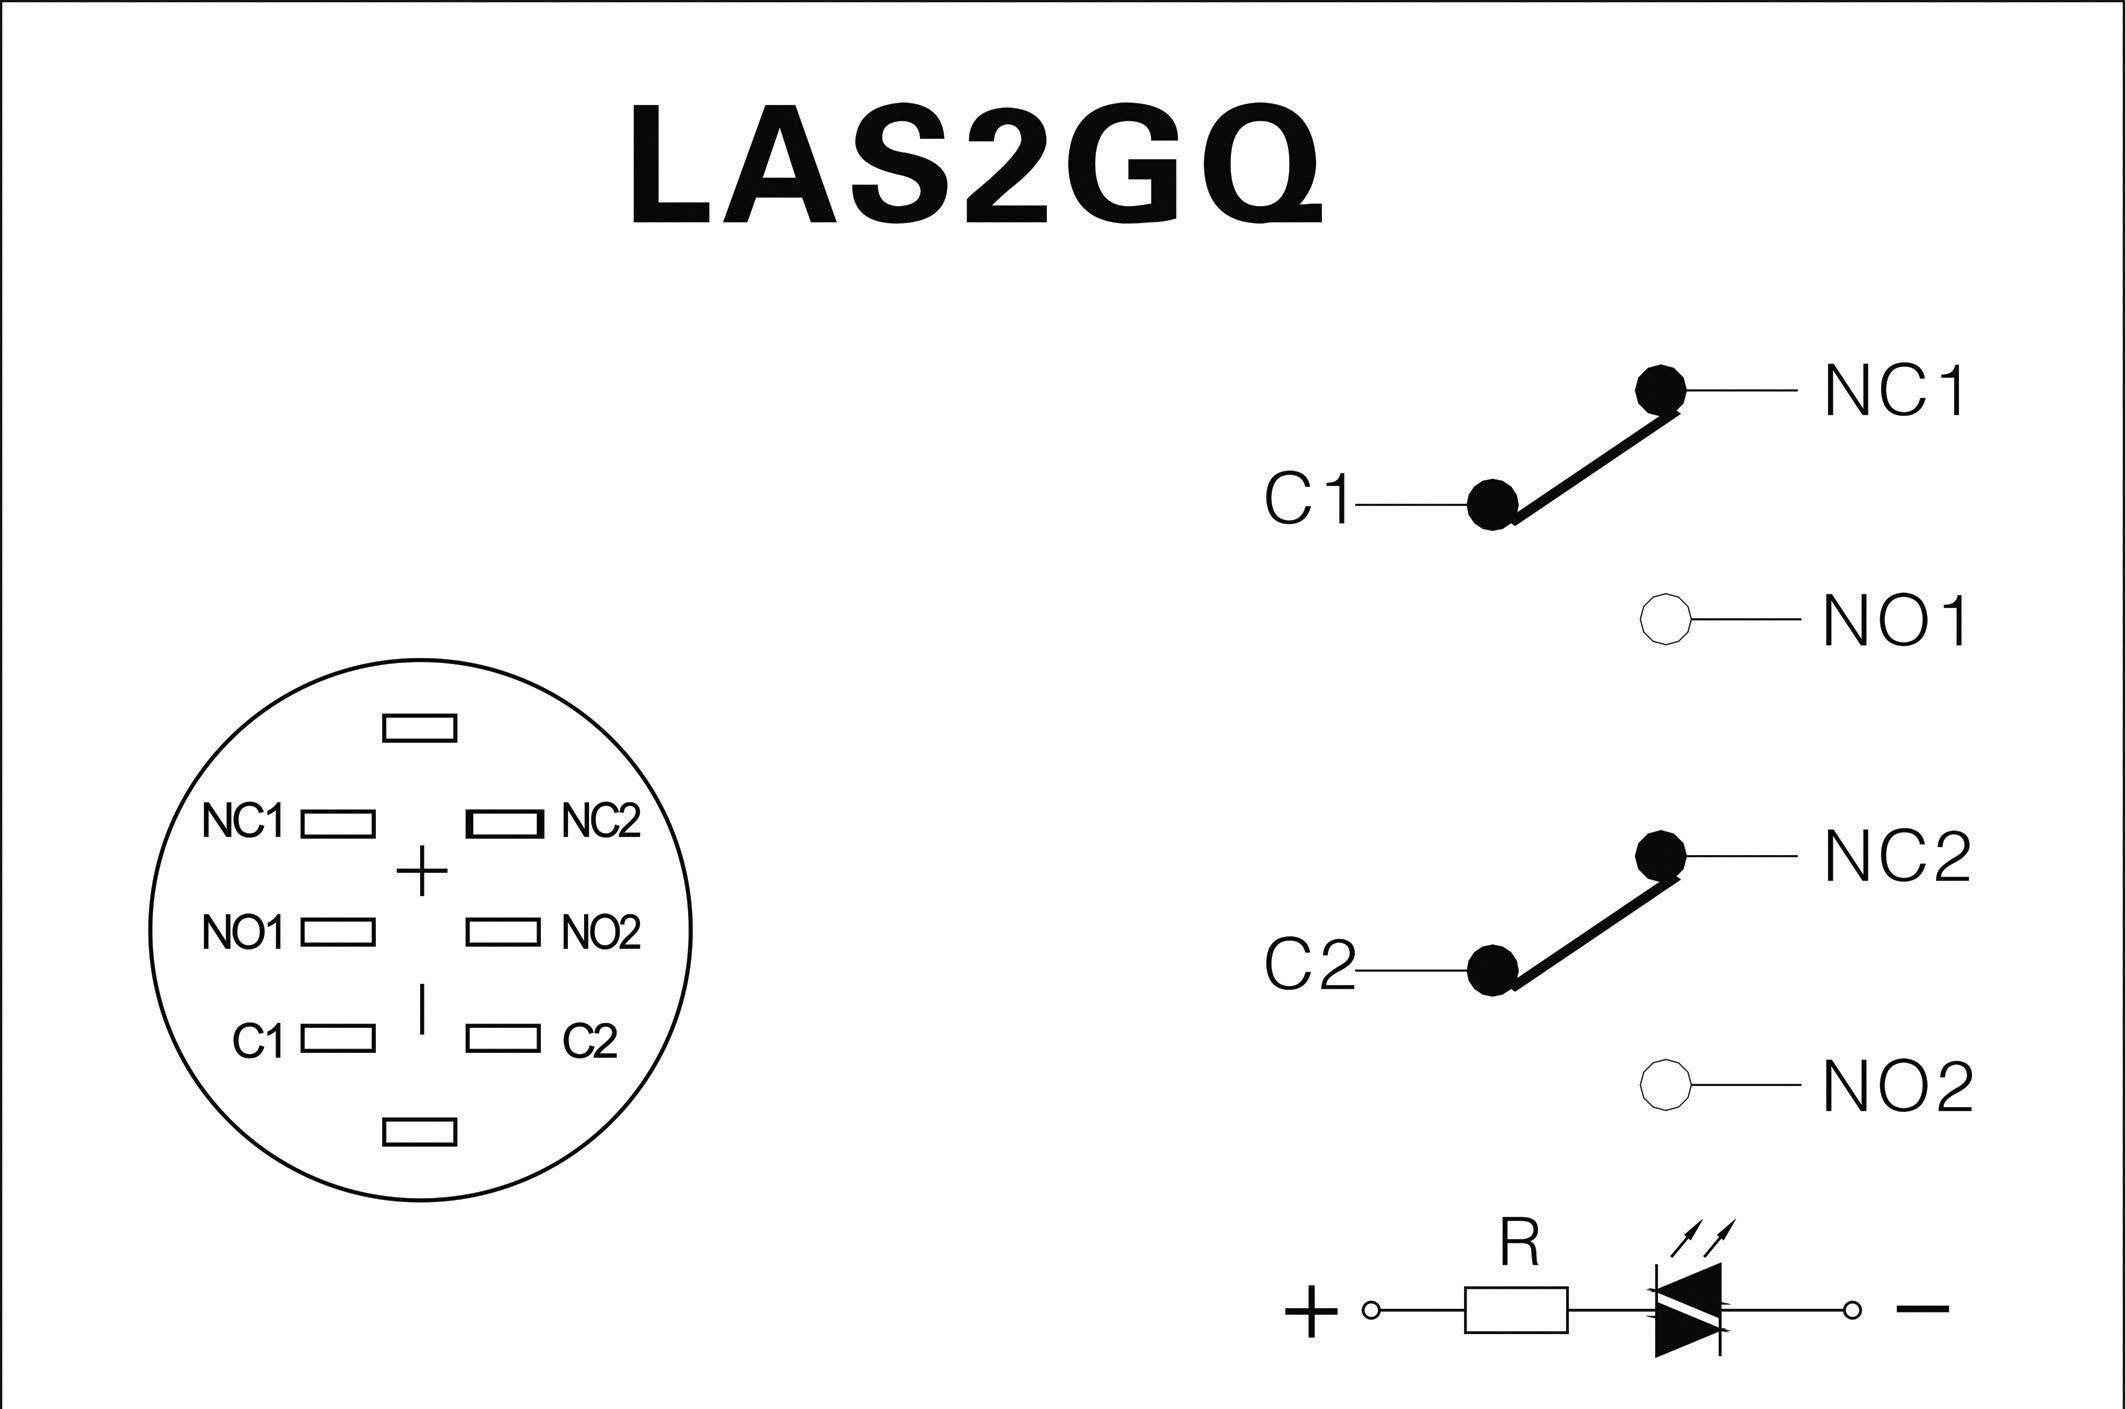 tla u010d u00edtkov u00fd sp u00edna u010d antivandal tru components las2gqh r  12v  s  p  250 v  ac  3 a  nerezov u00e1 ocel